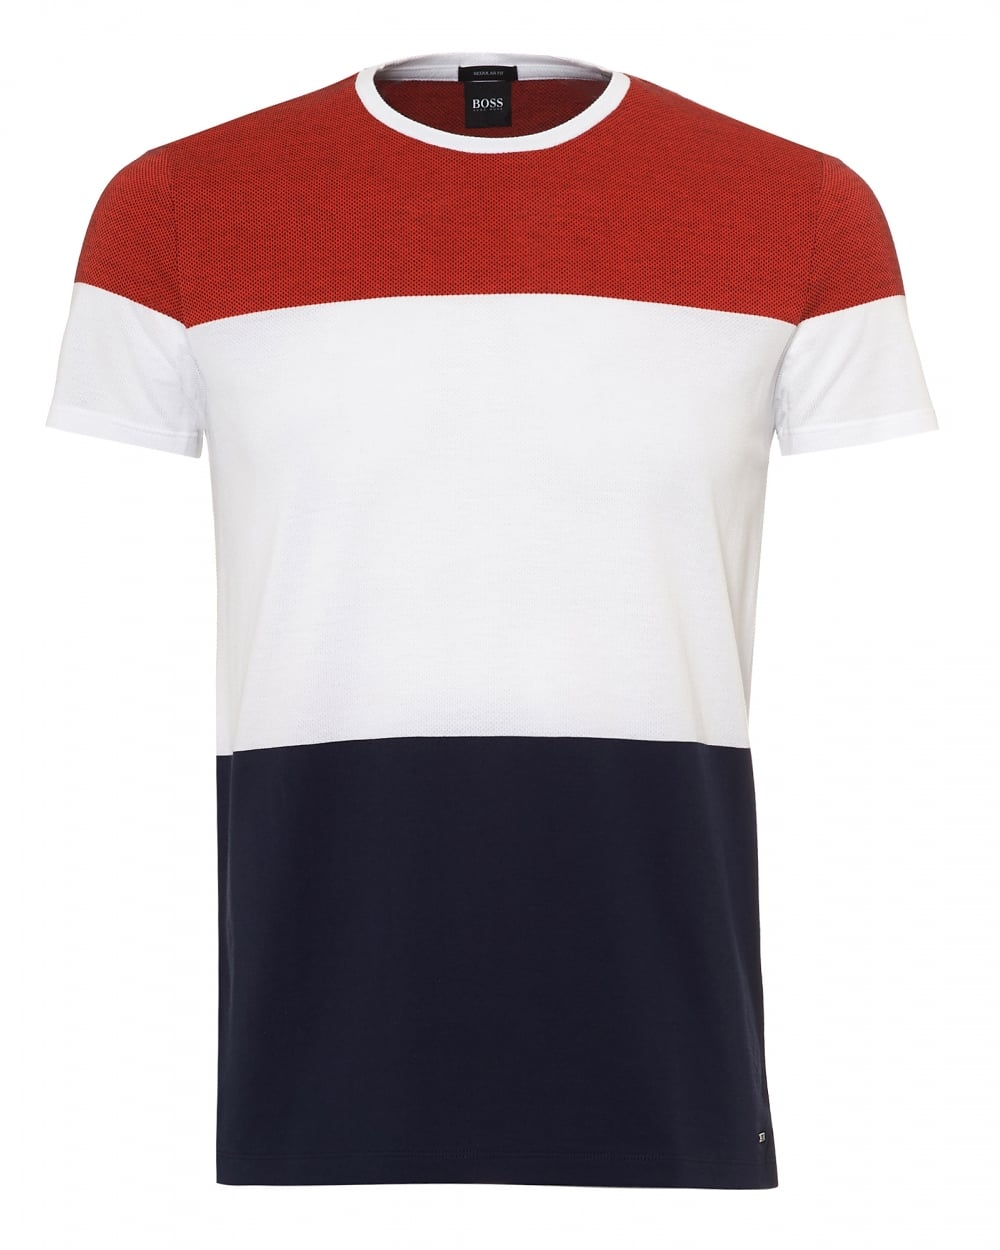 75ce7dd61 Hugo Boss Black Mens Tiburt T-Shirt, Orange White Navy Blue Tee